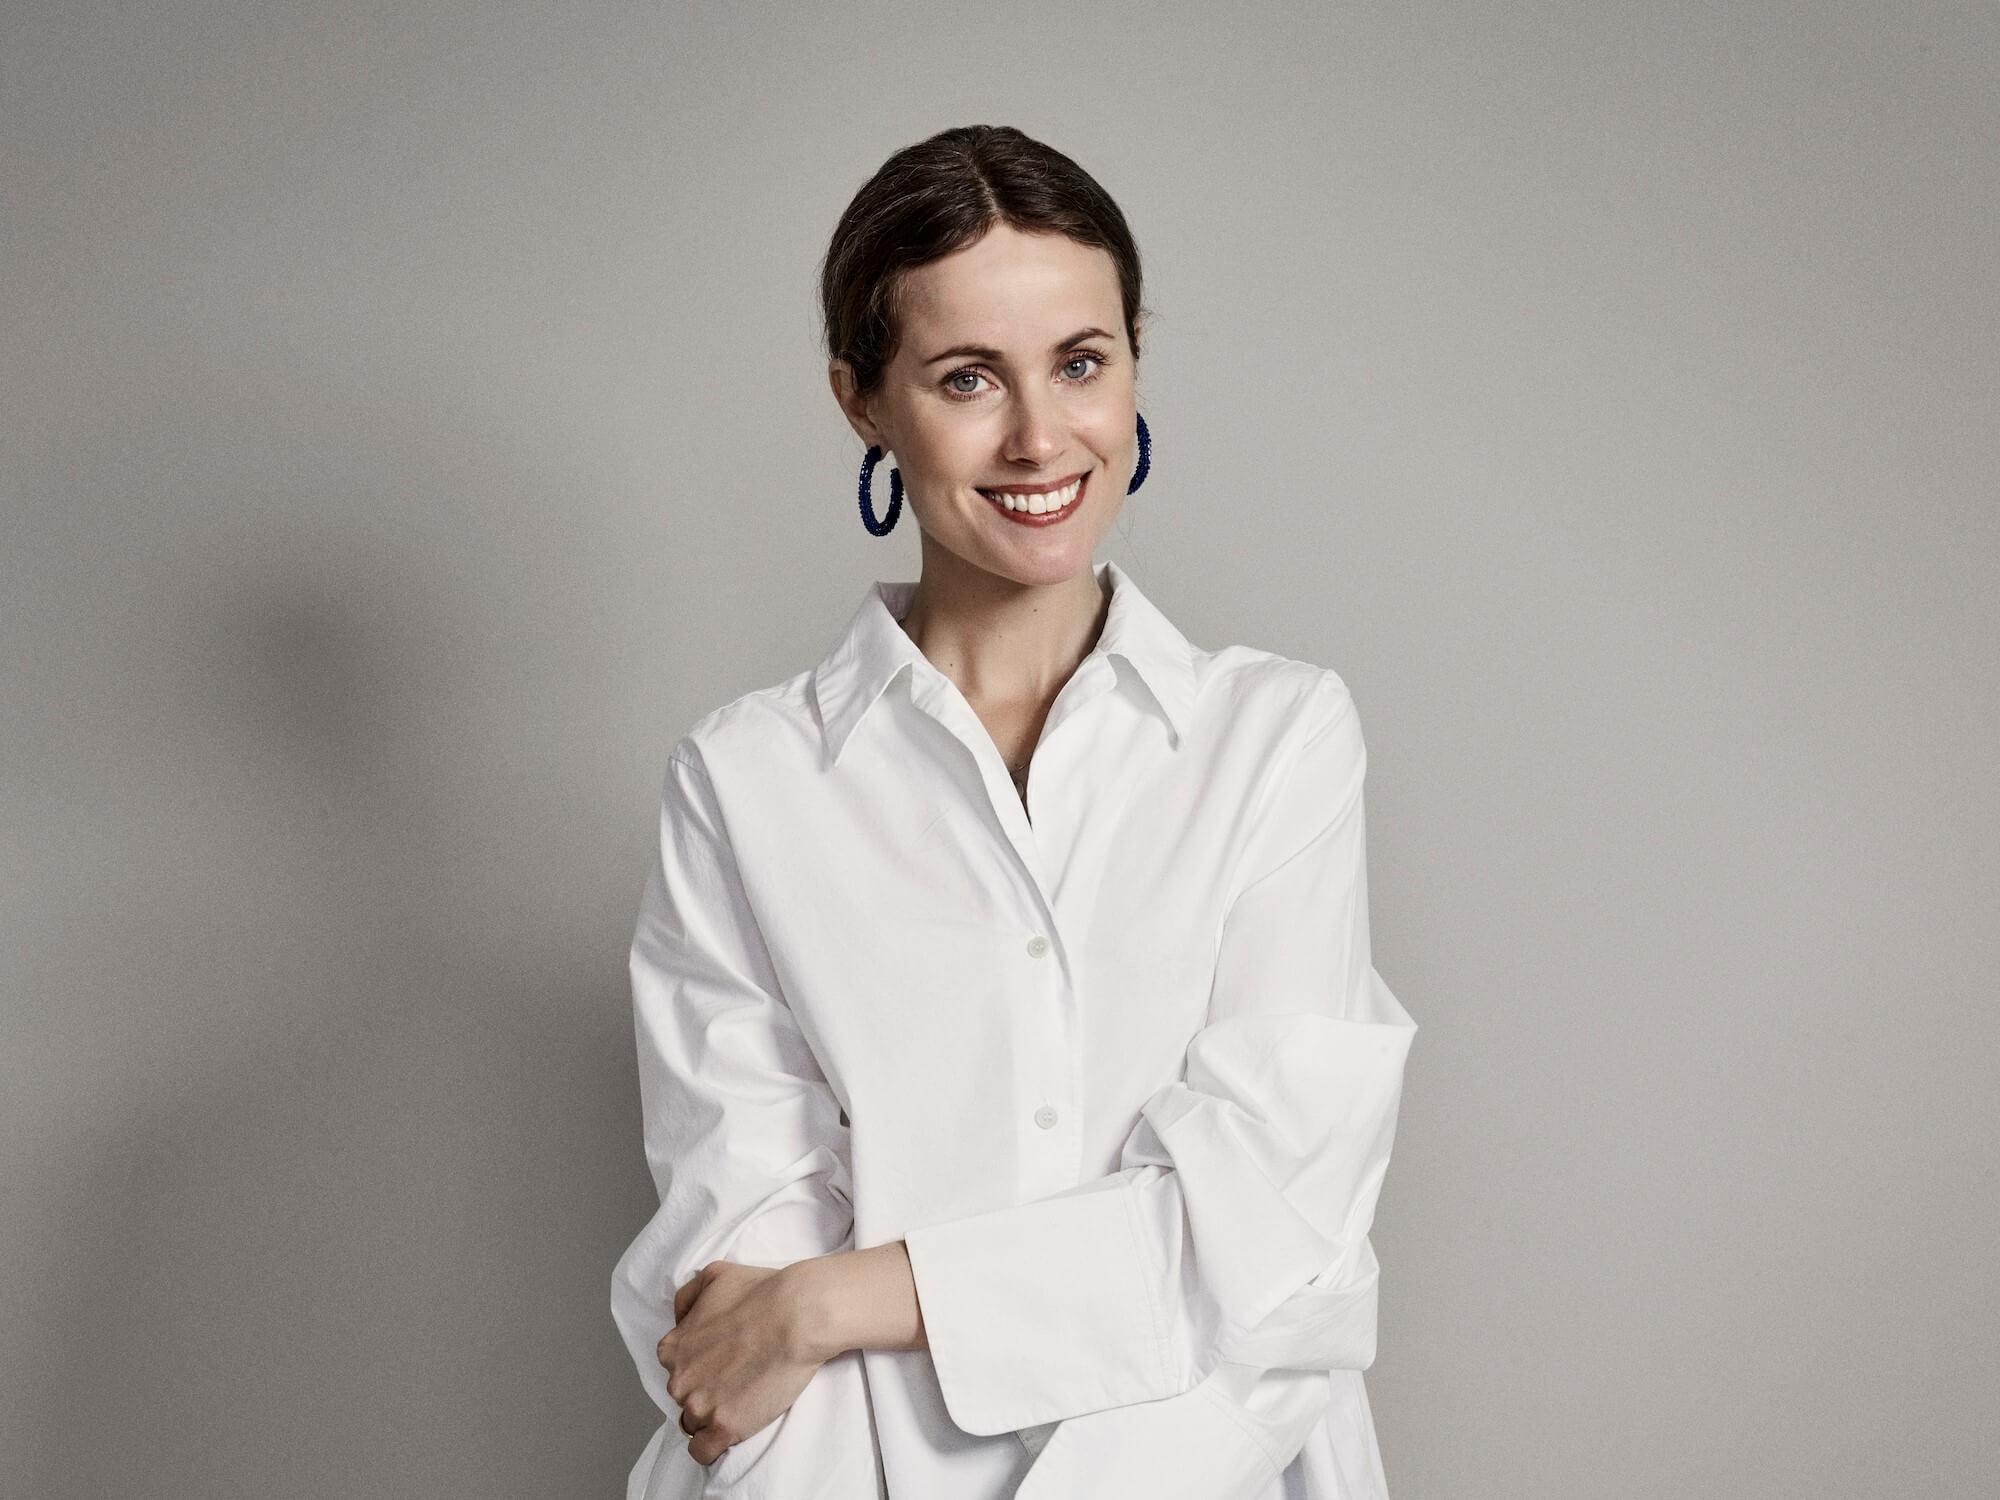 Cecilie Thorsmark Copenhagen Fashion Week har fundet sin nye direktør